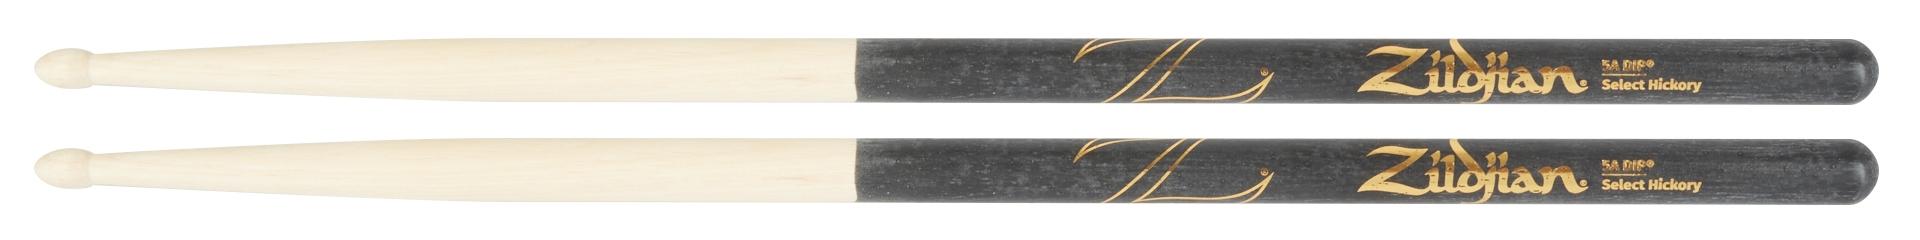 ZILDJIAN 5A Wood Black Dip